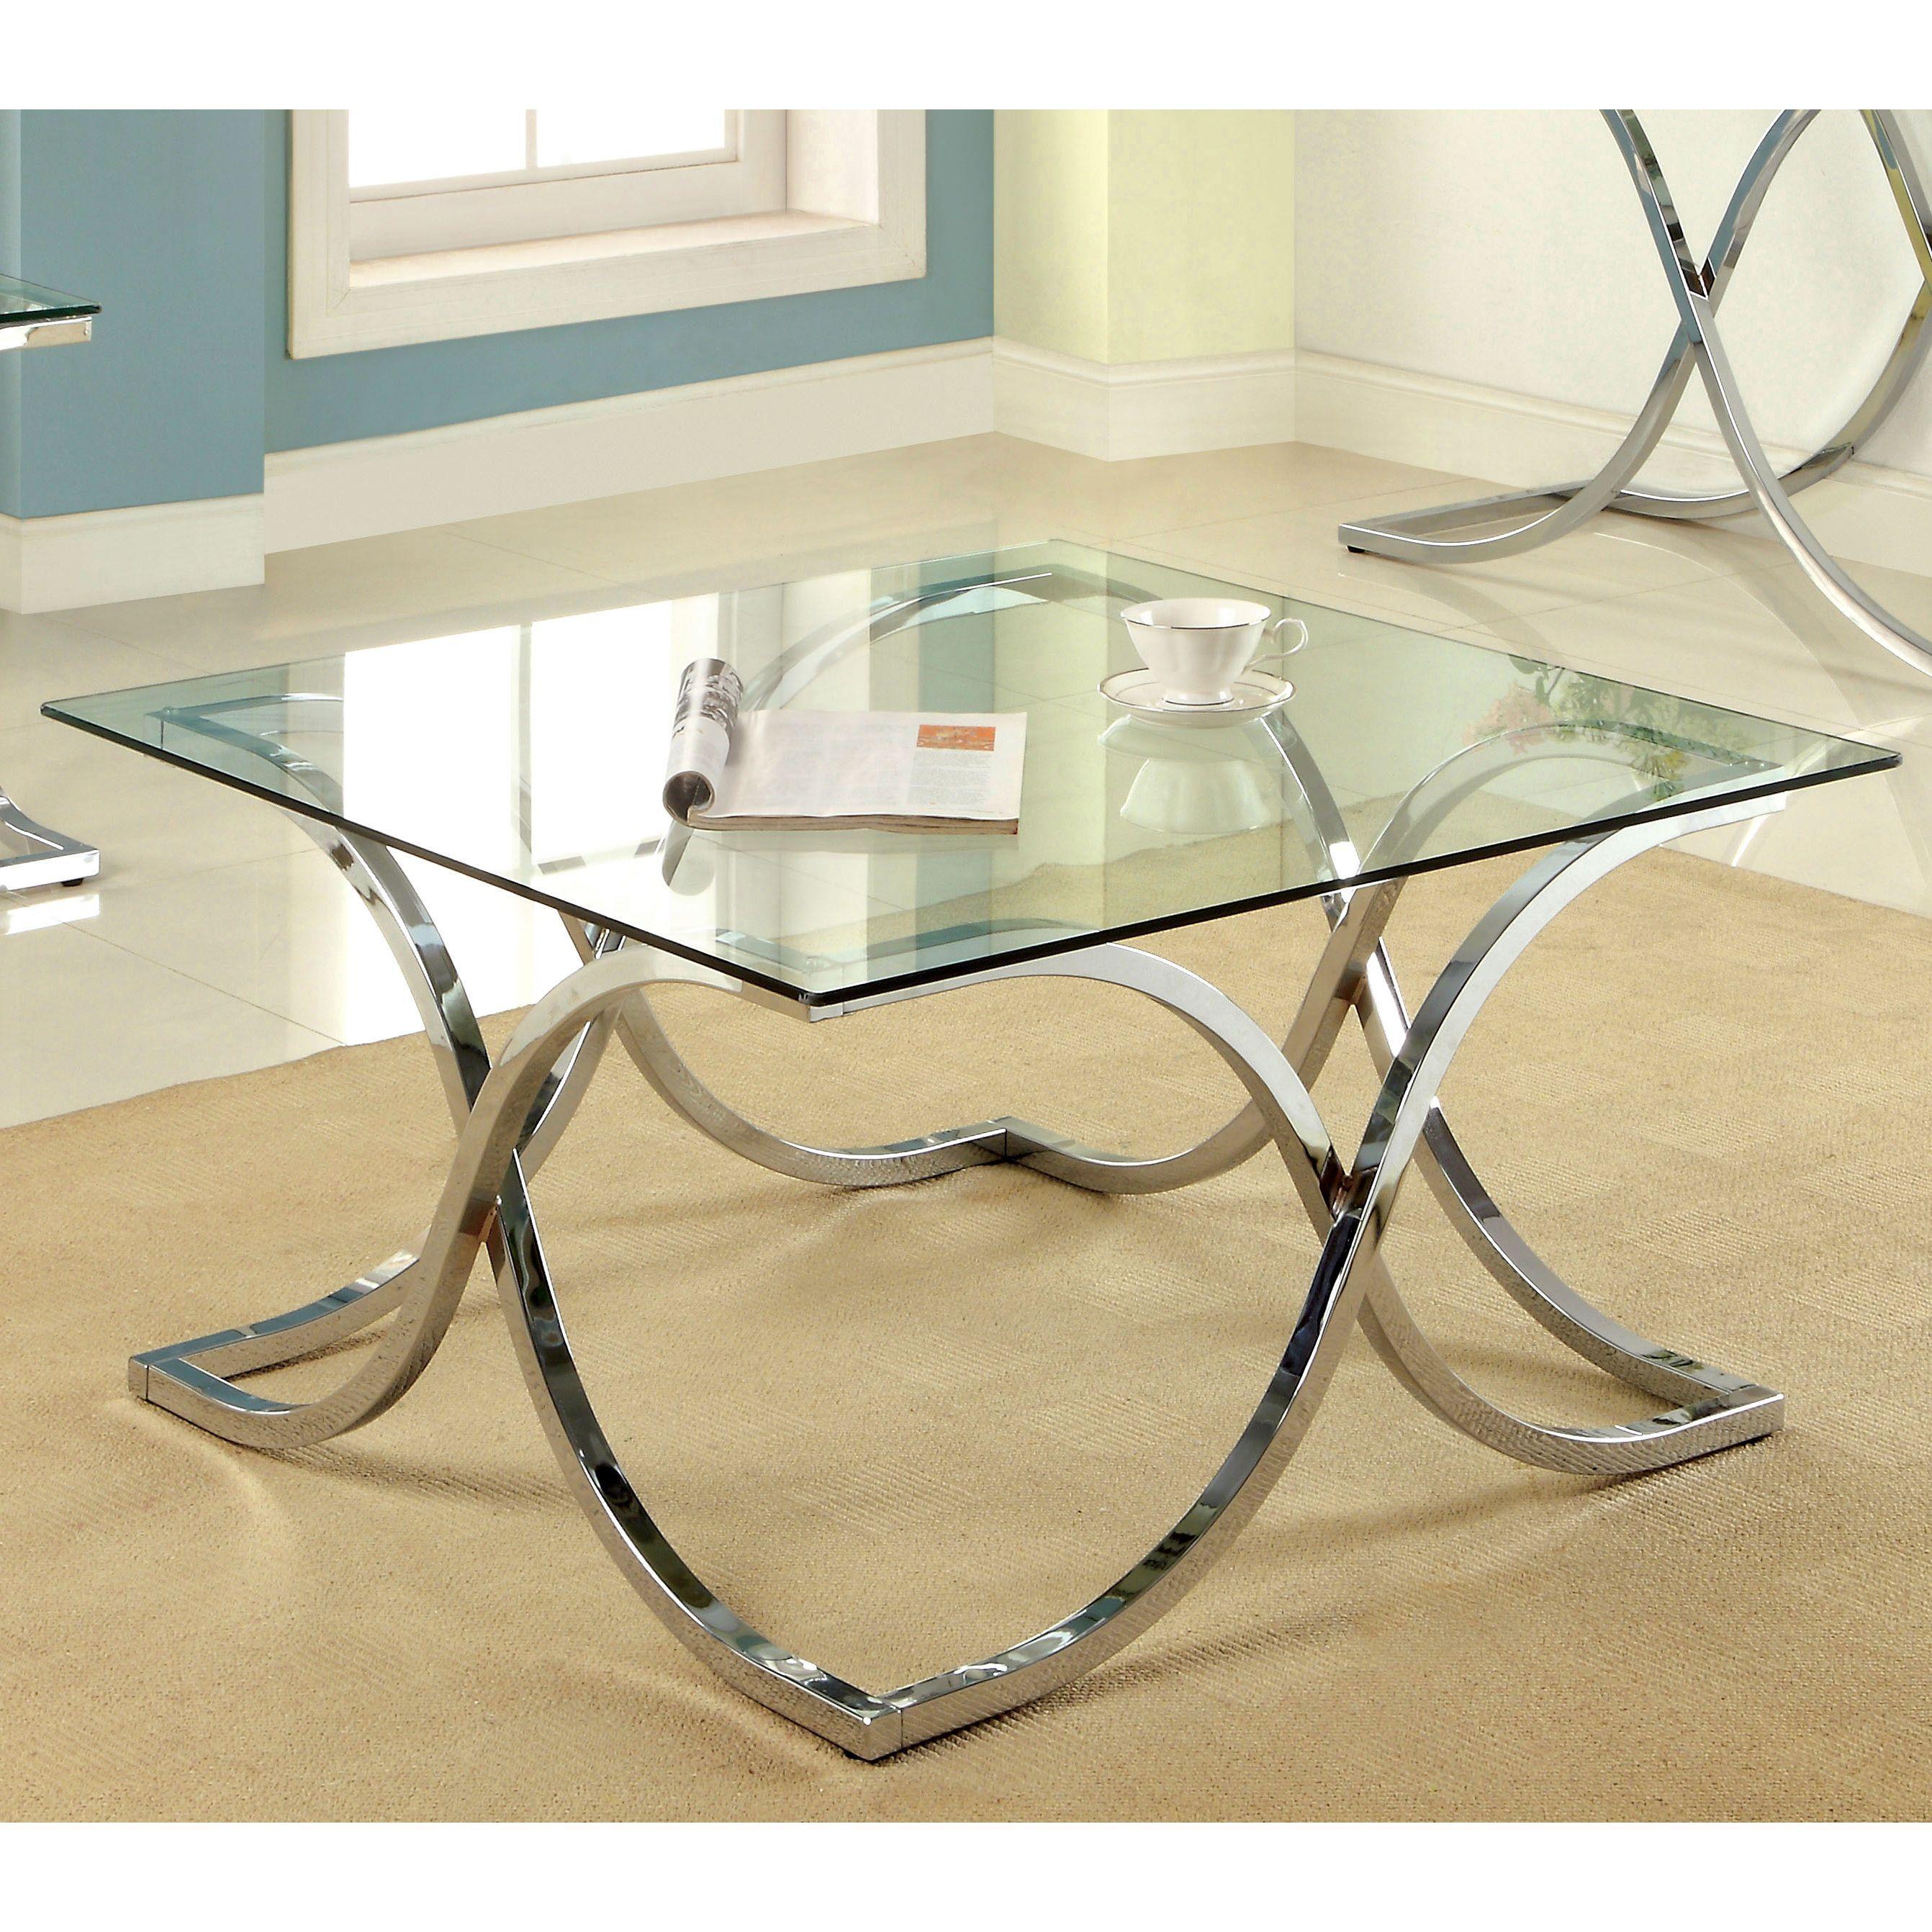 Harper Glass Coffee Table Set Contemporary Black Chrome Color